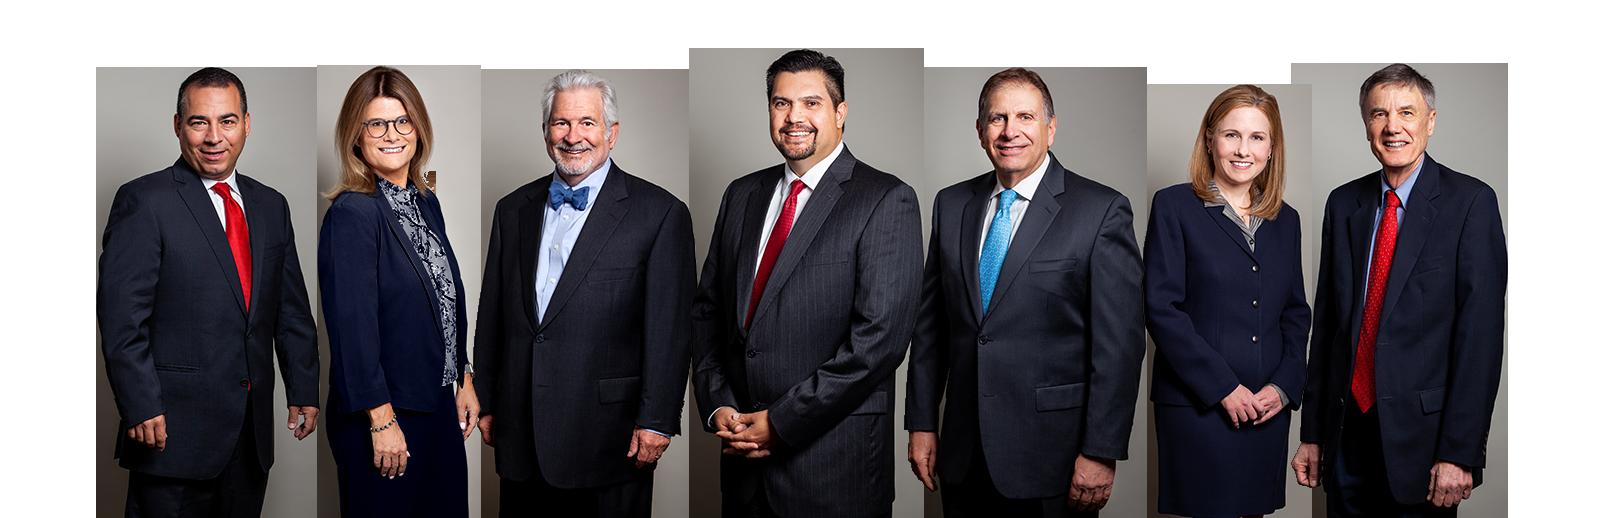 Dyer Bregman & Ferris, PLLC Partners